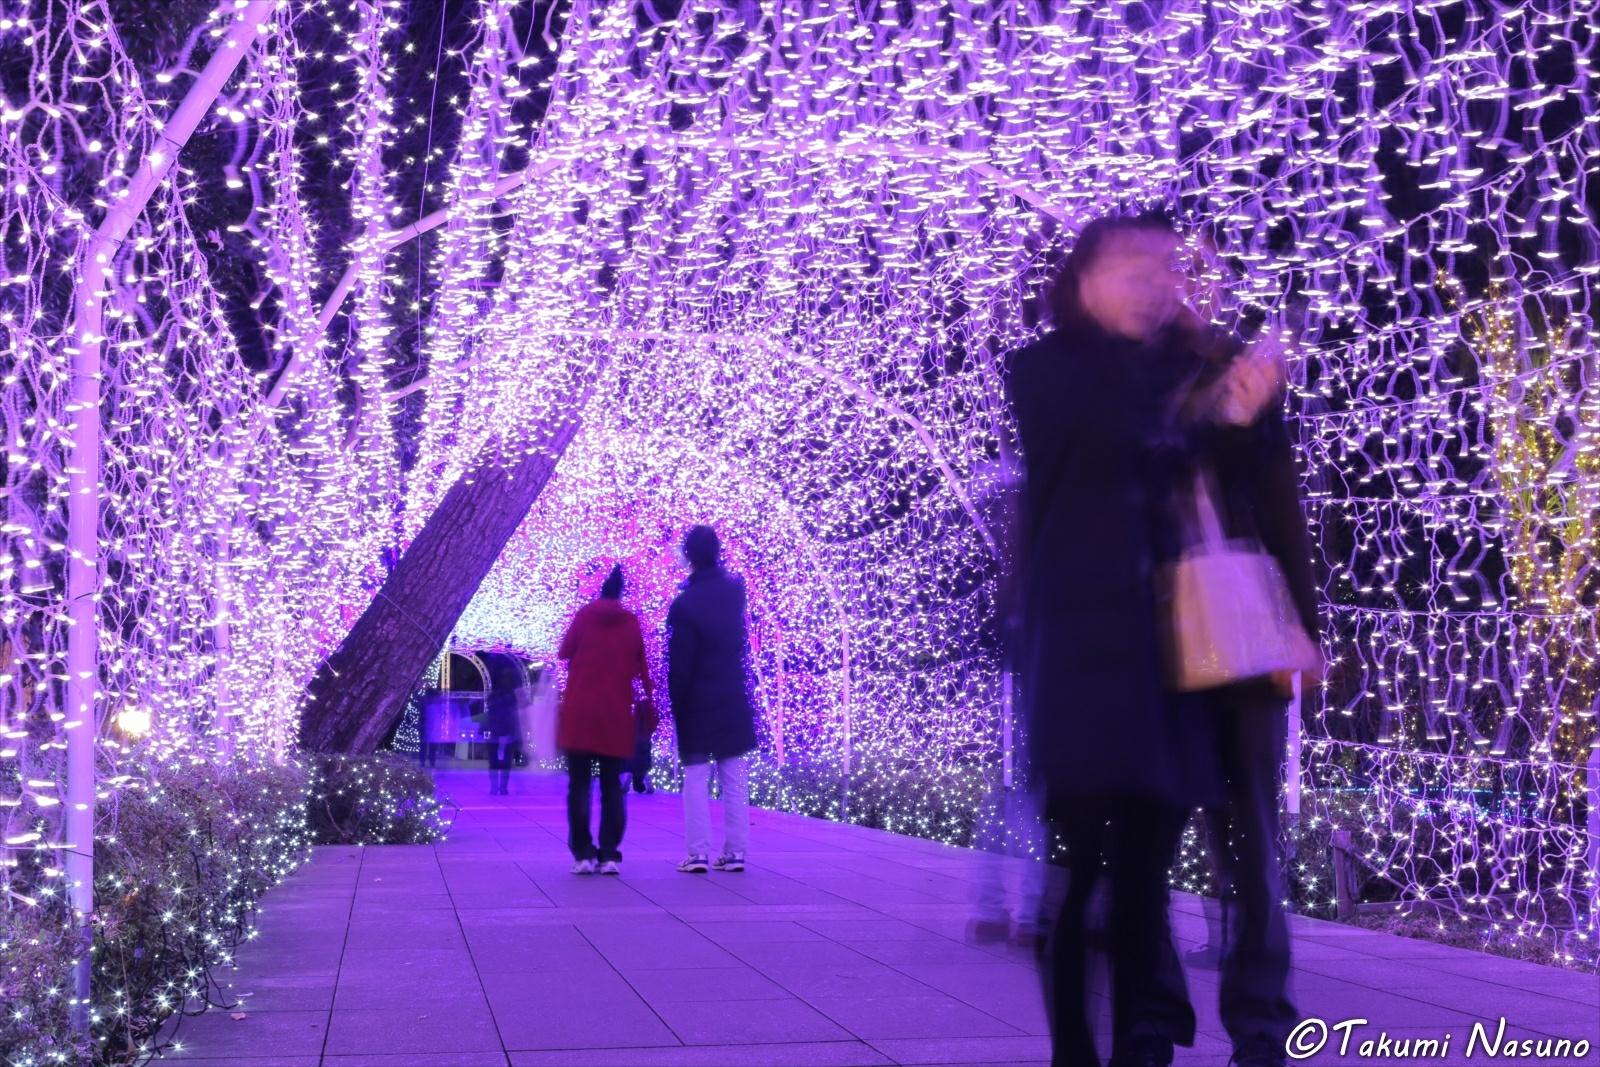 Illumination of Wisteria at Enoshima Island